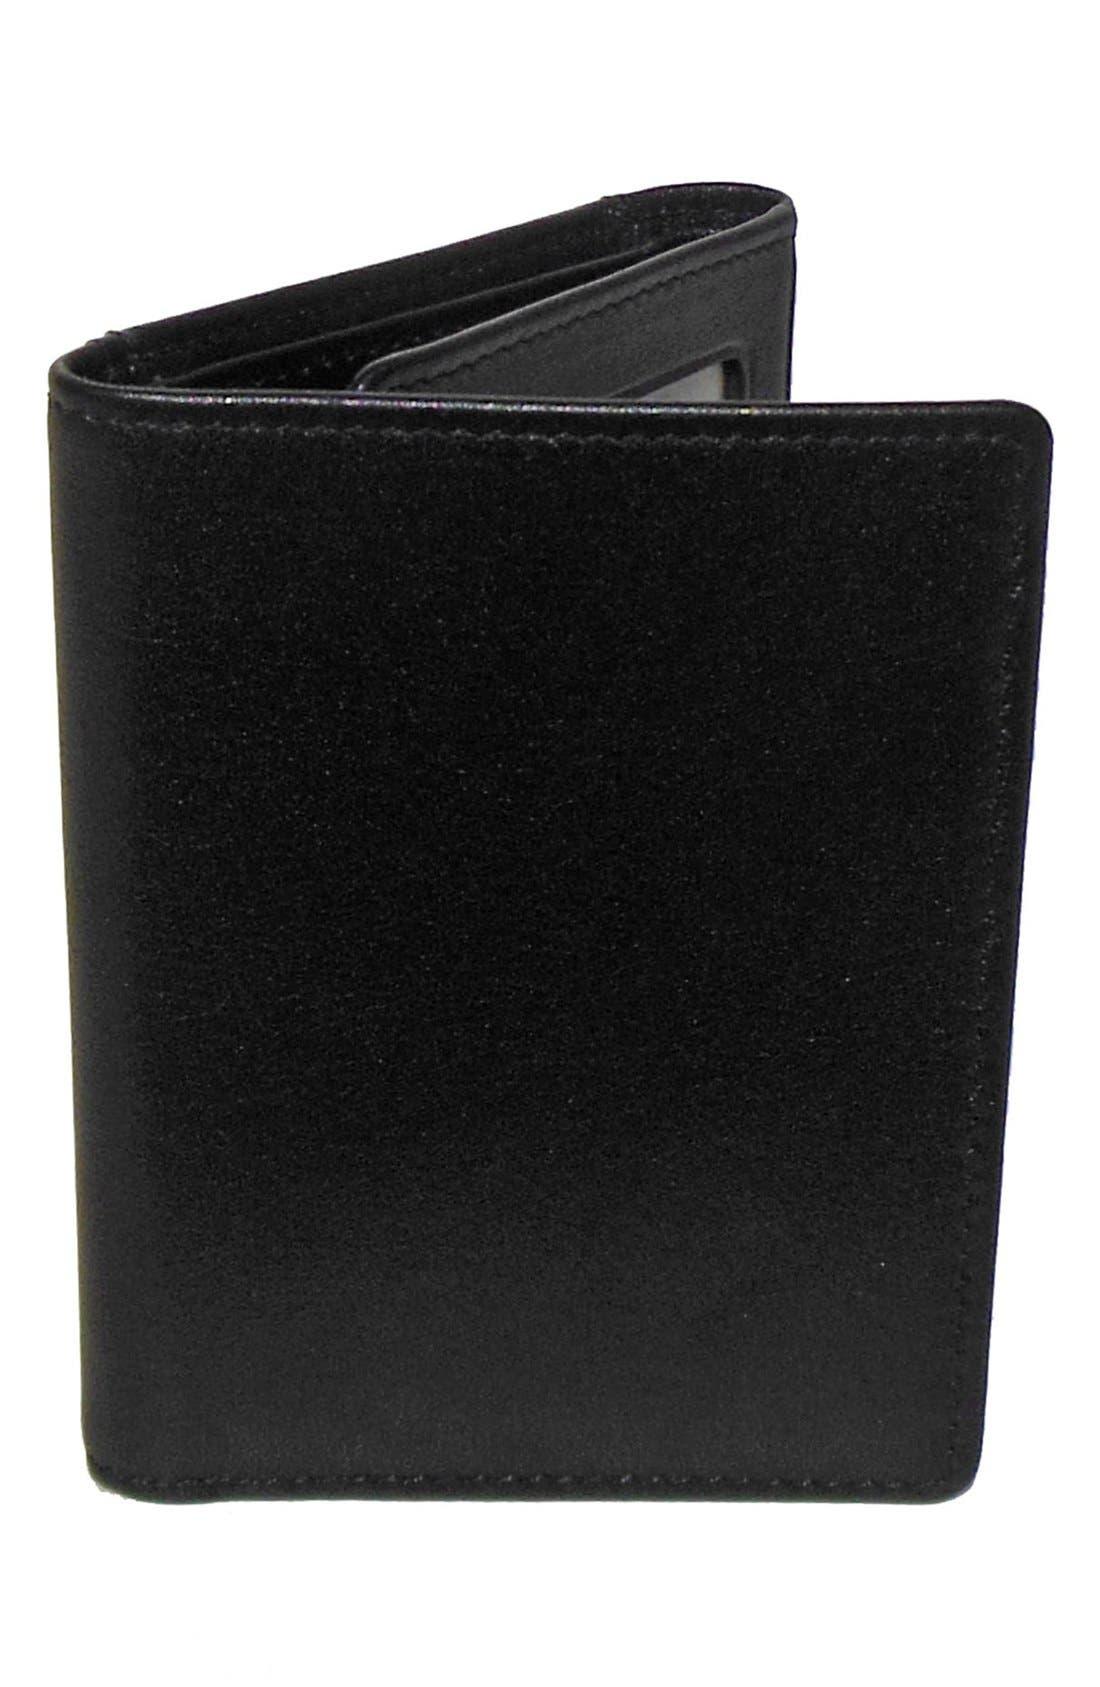 Alternate Image 1 Selected - Boconi 'Grant' RFID Blocker Leather Trifold Wallet